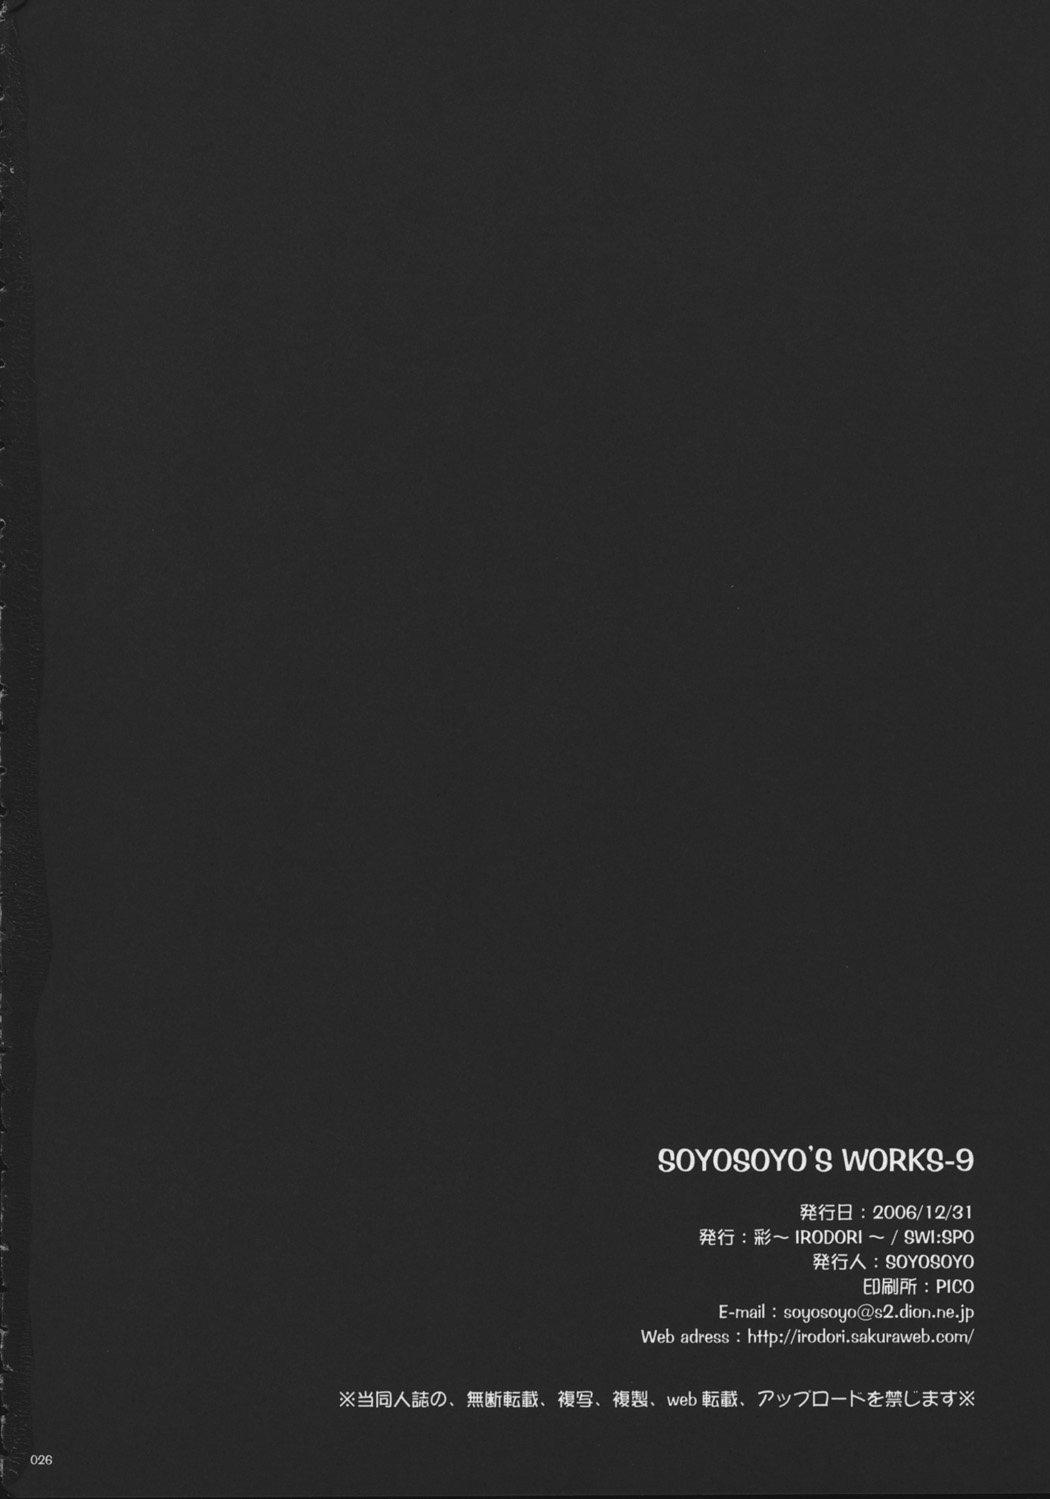 SOYOSOYO'S WORKS-9 24